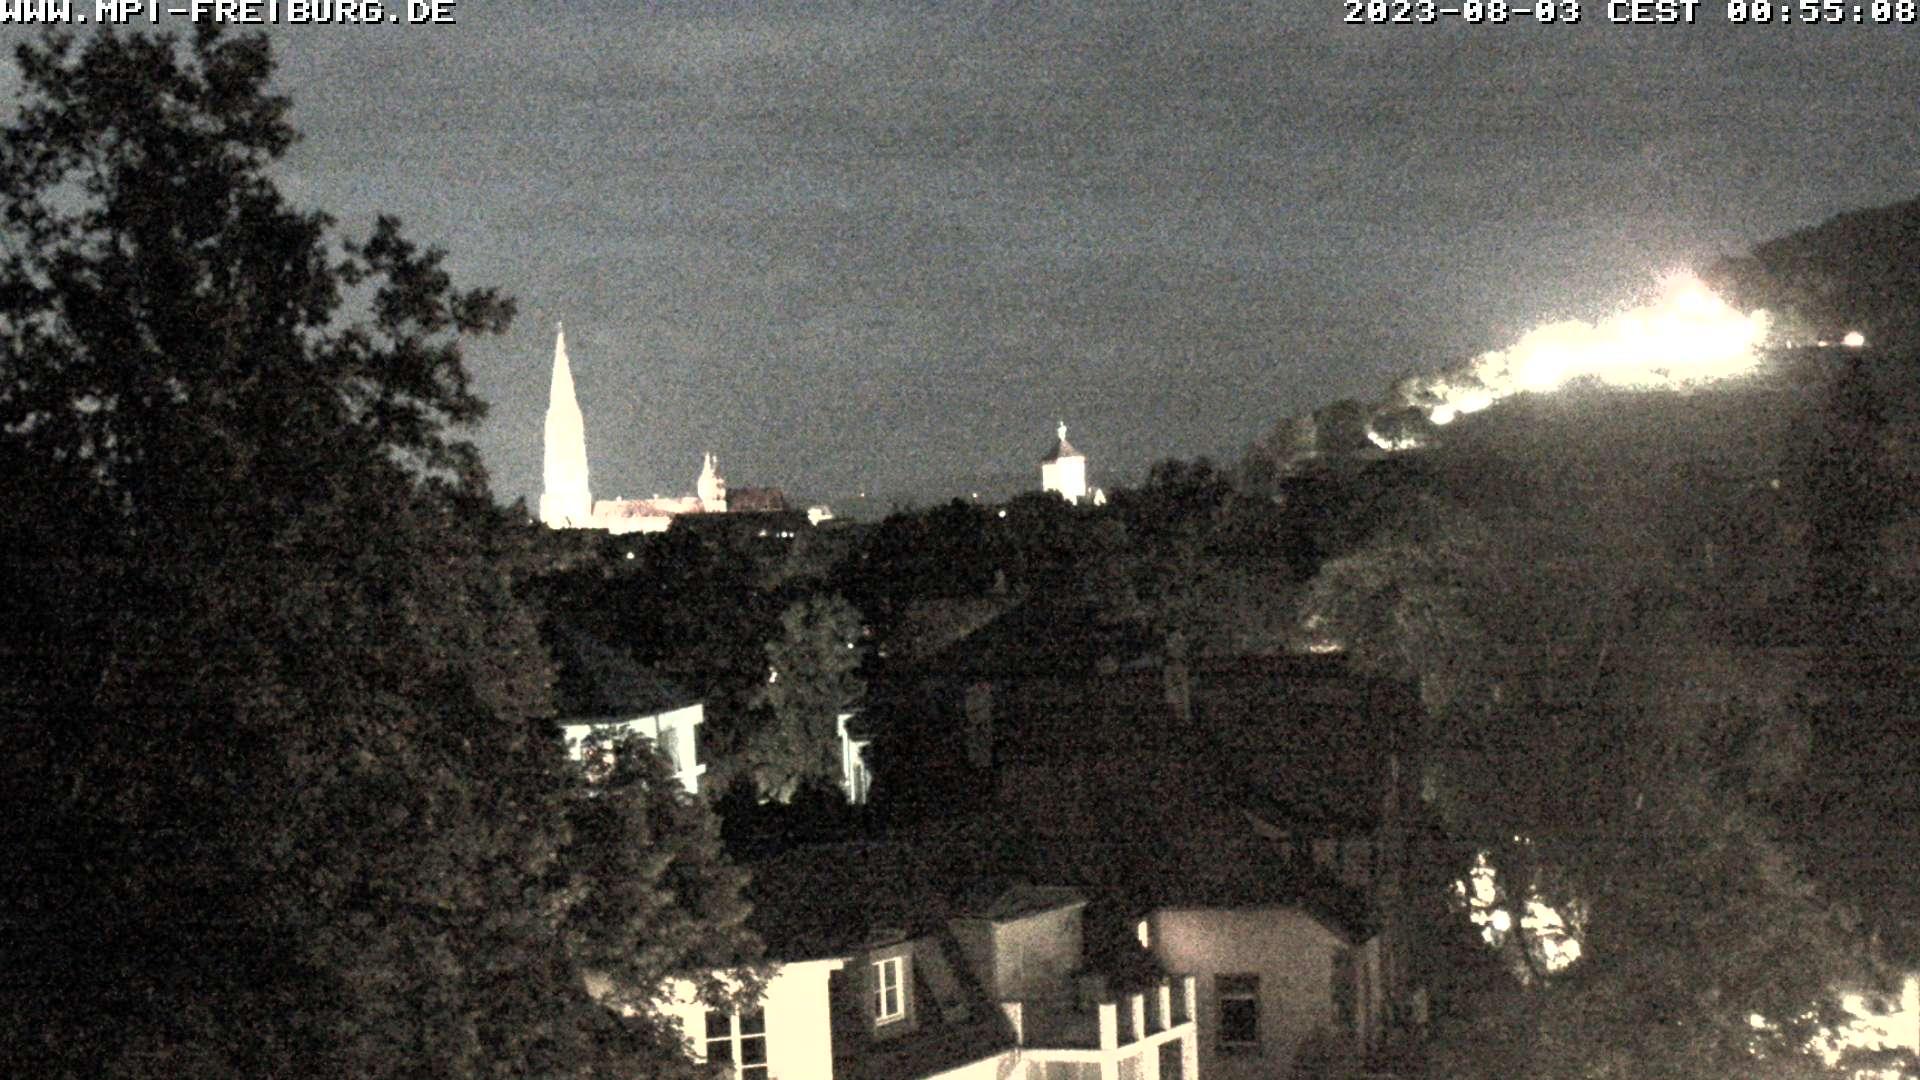 Freiburg im Breisgau Skyline Panorama 2 (Zoom)